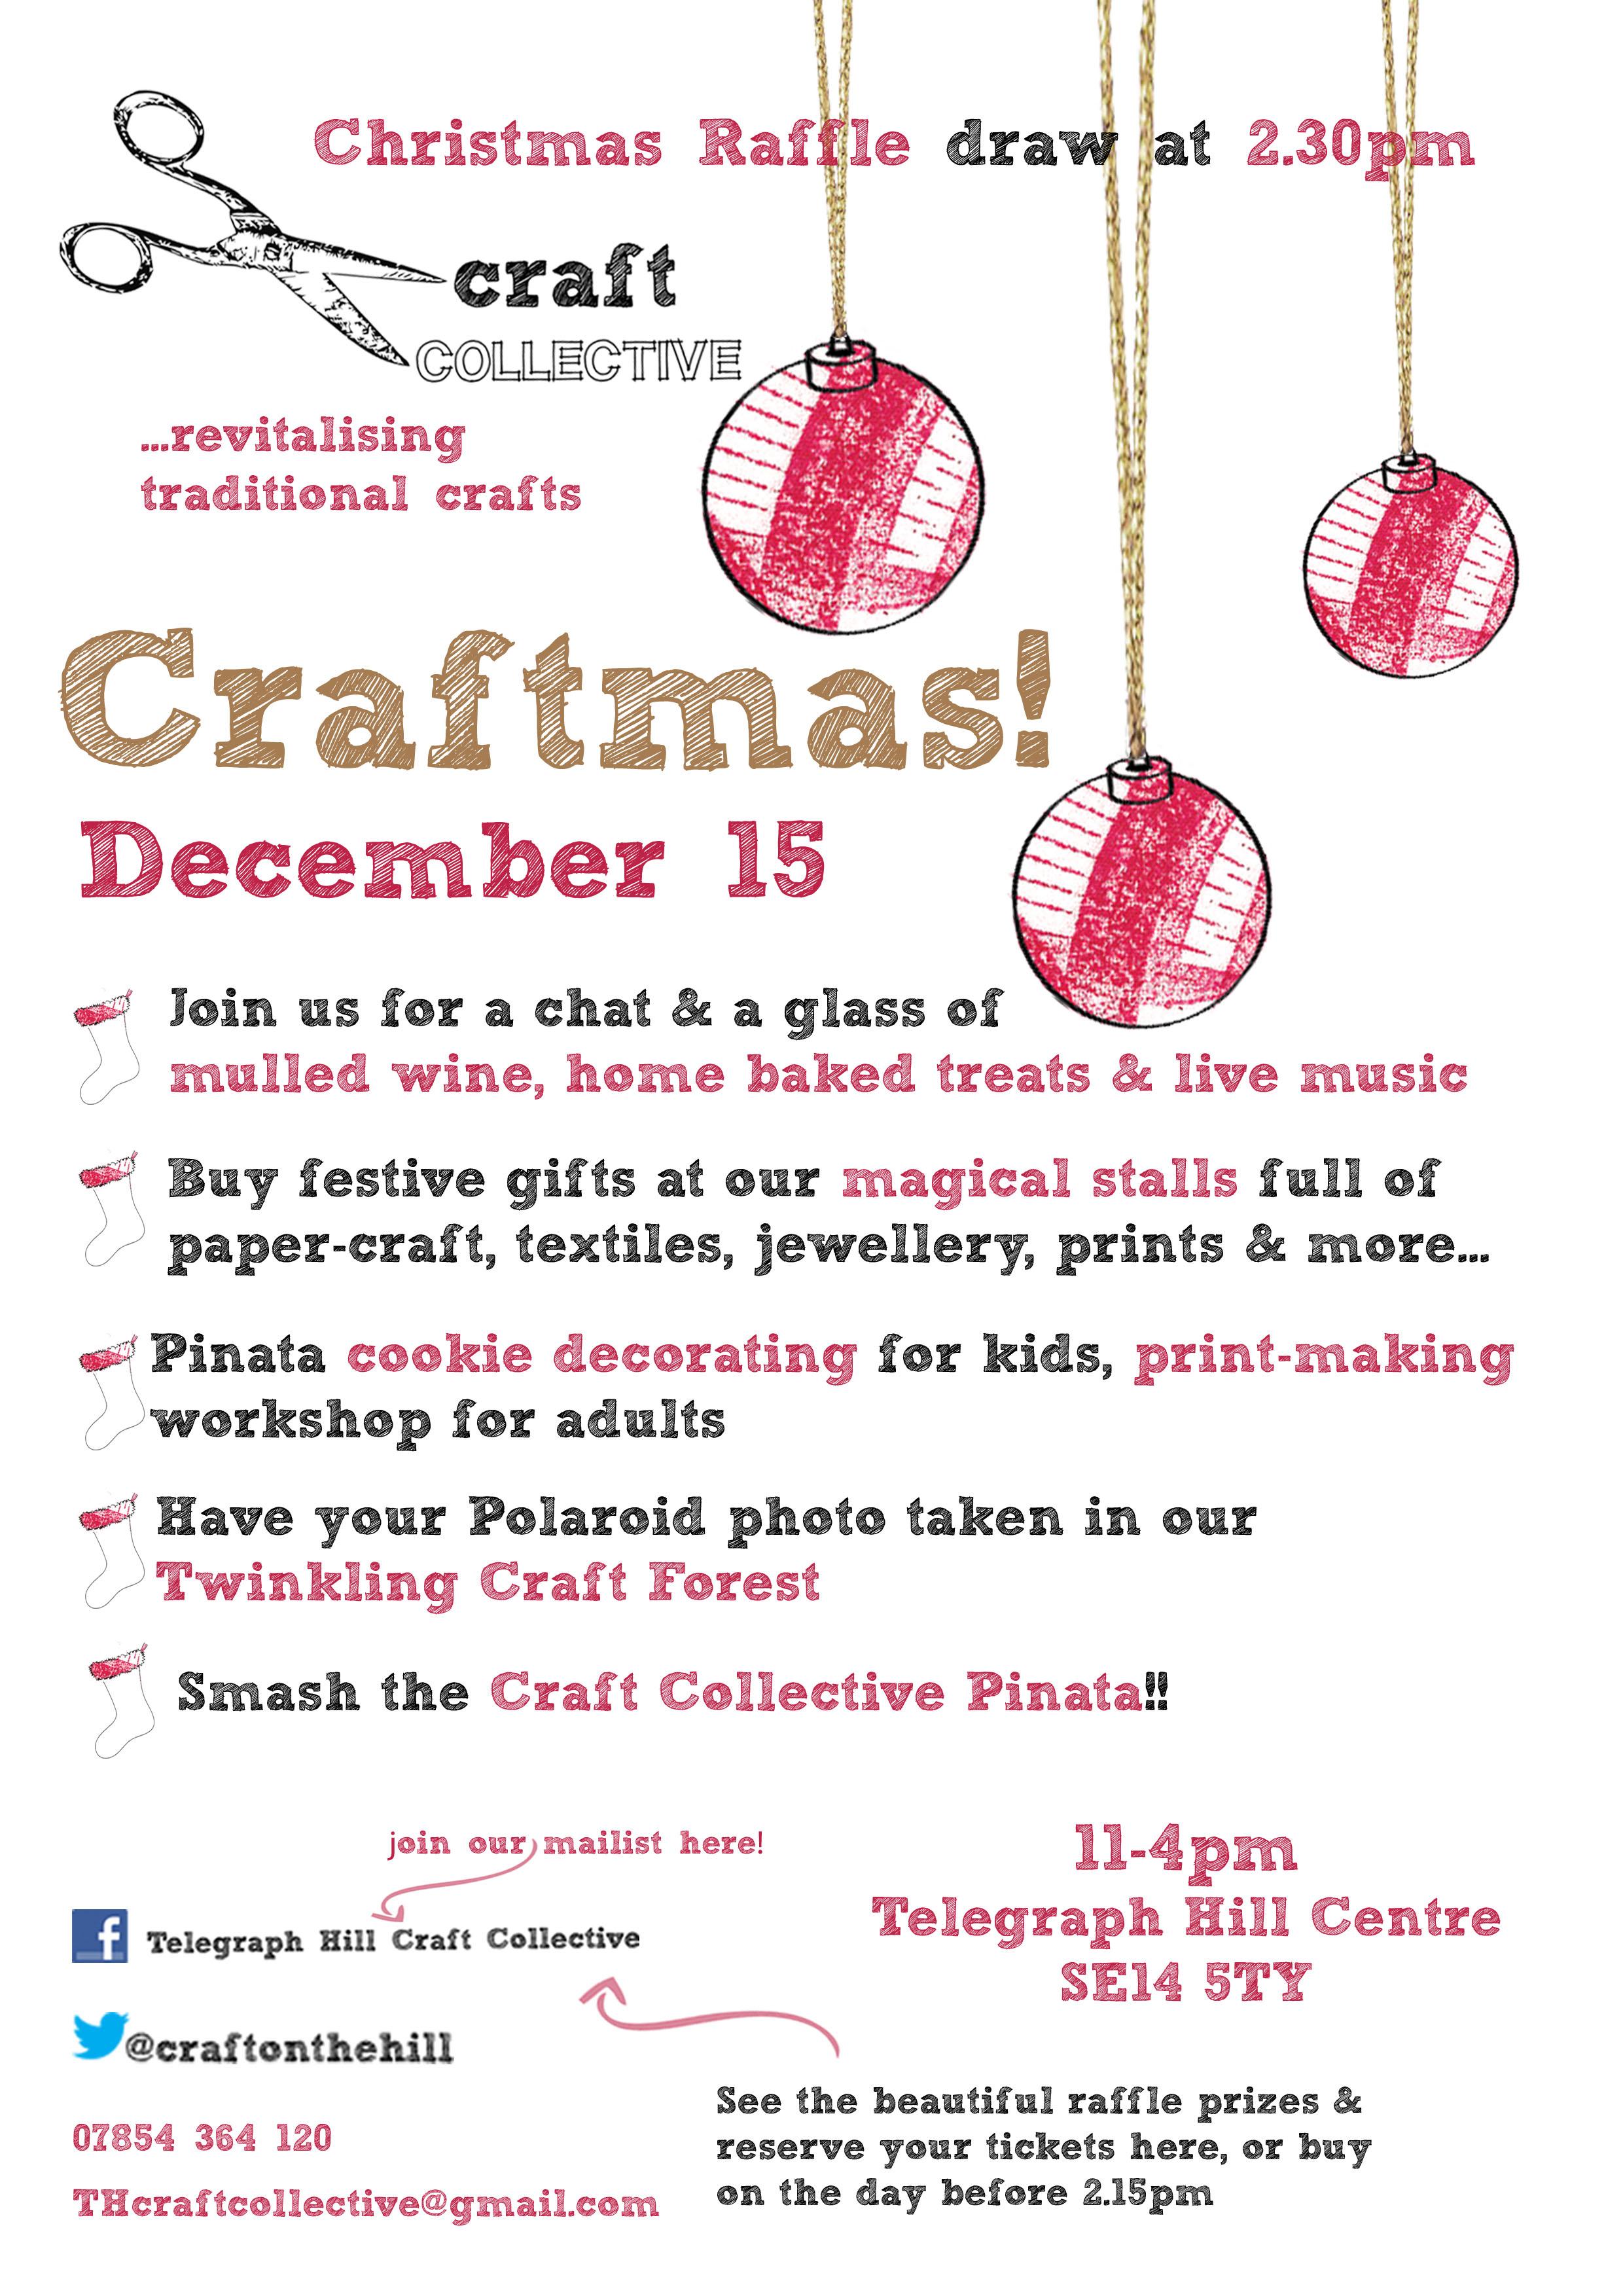 Craft Collective - 15th December, Telegraph Hill Centre